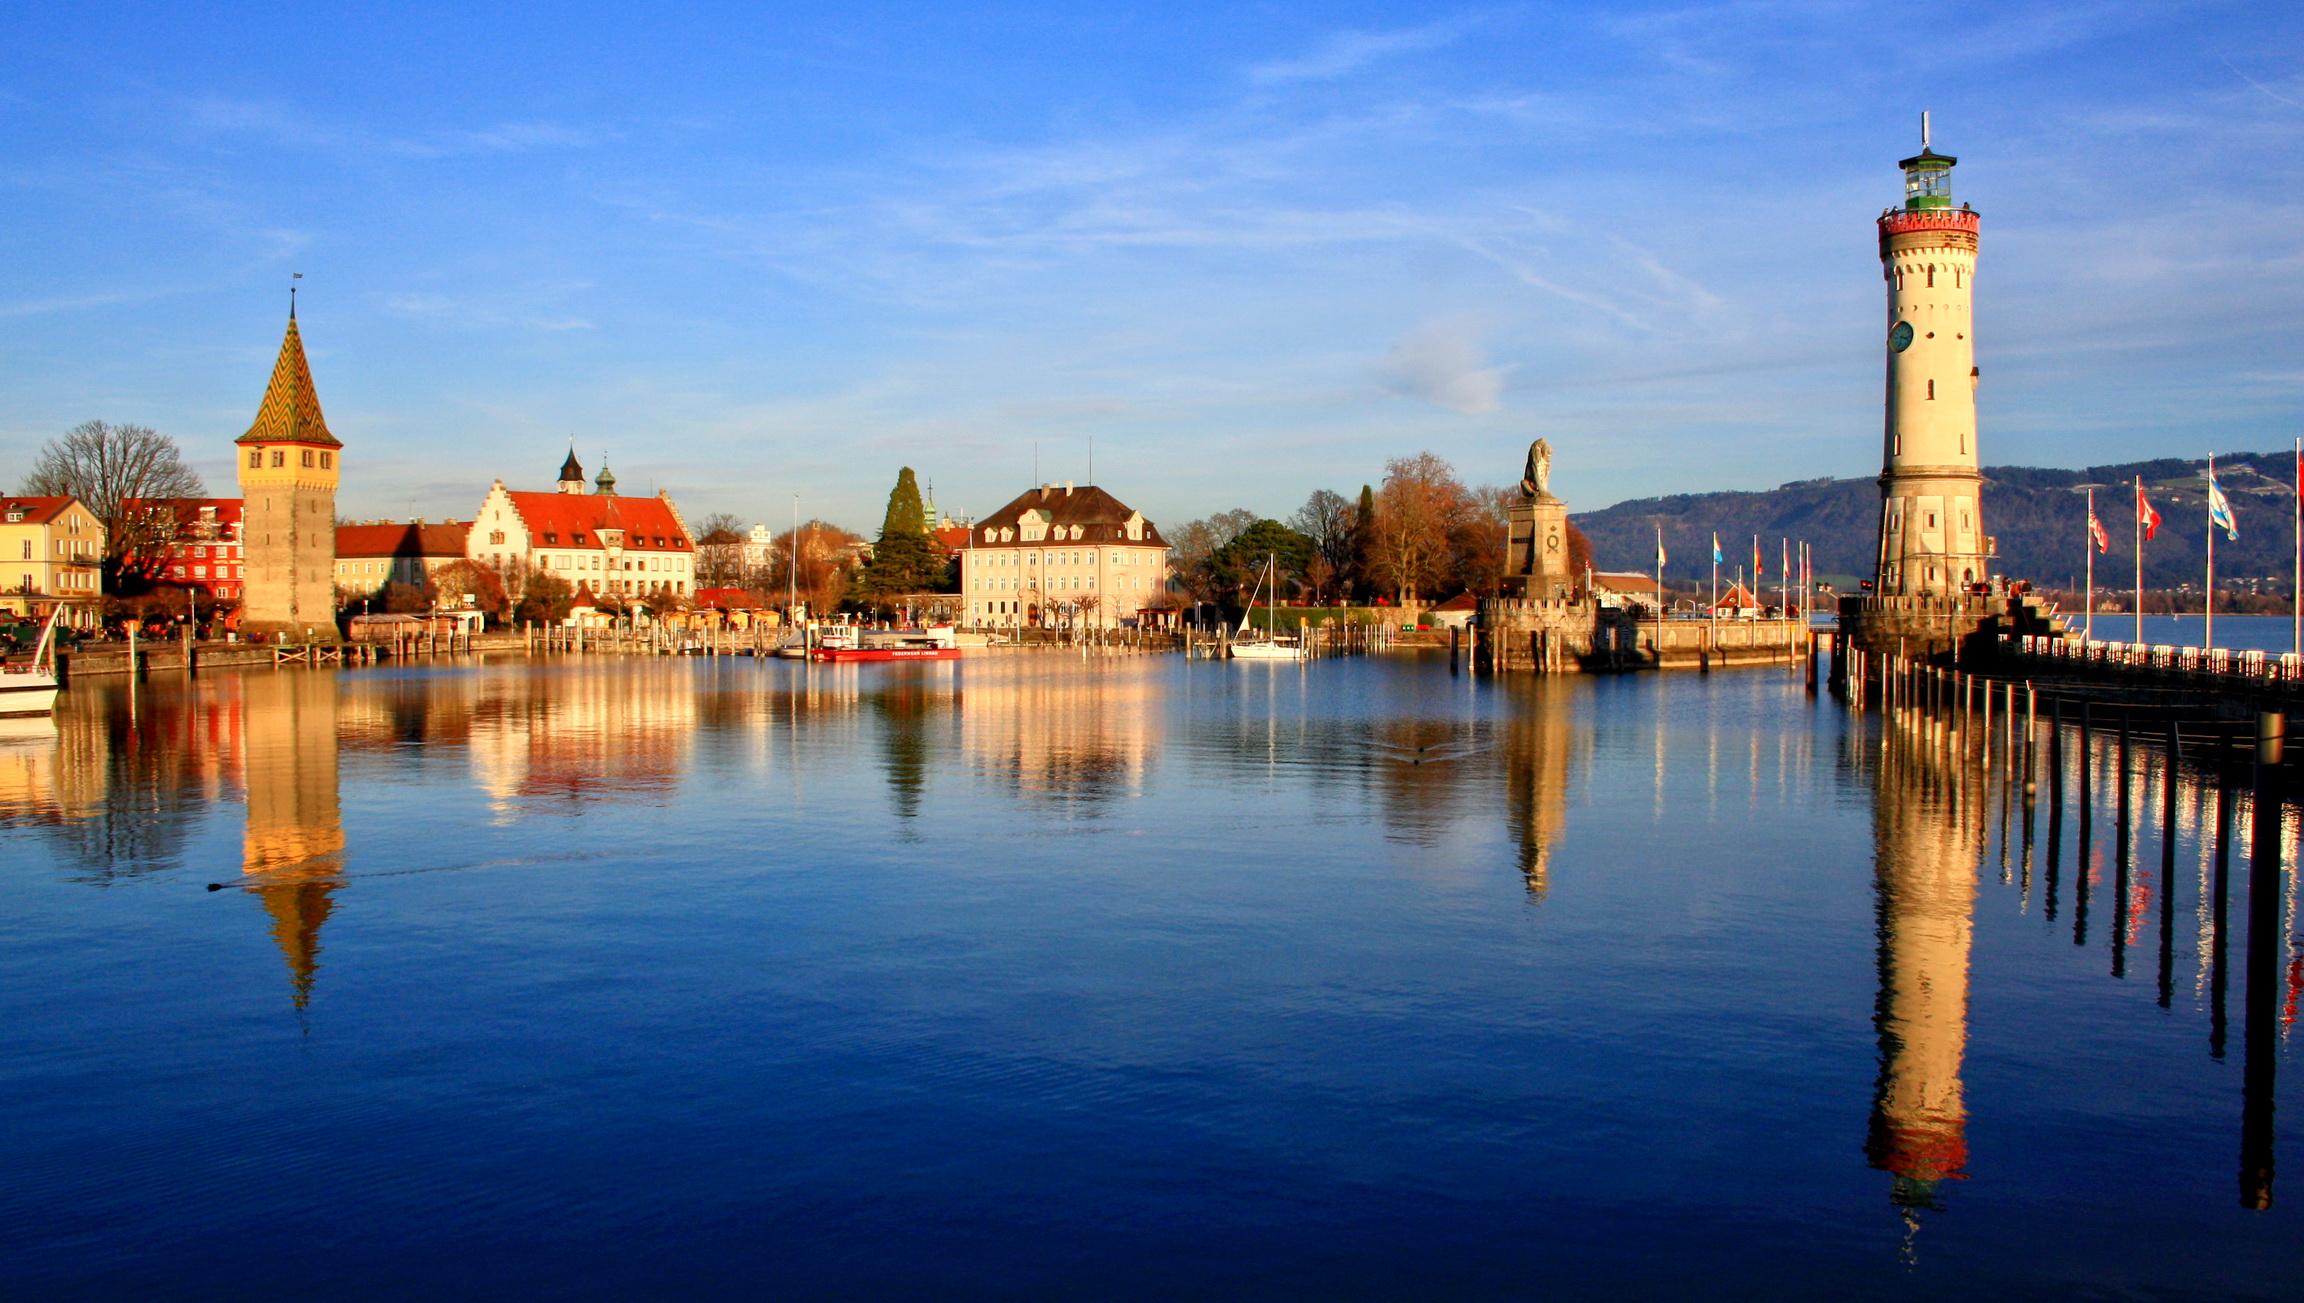 Lorch Village, Hesse, Rhine River, Germany  № 78297  скачать